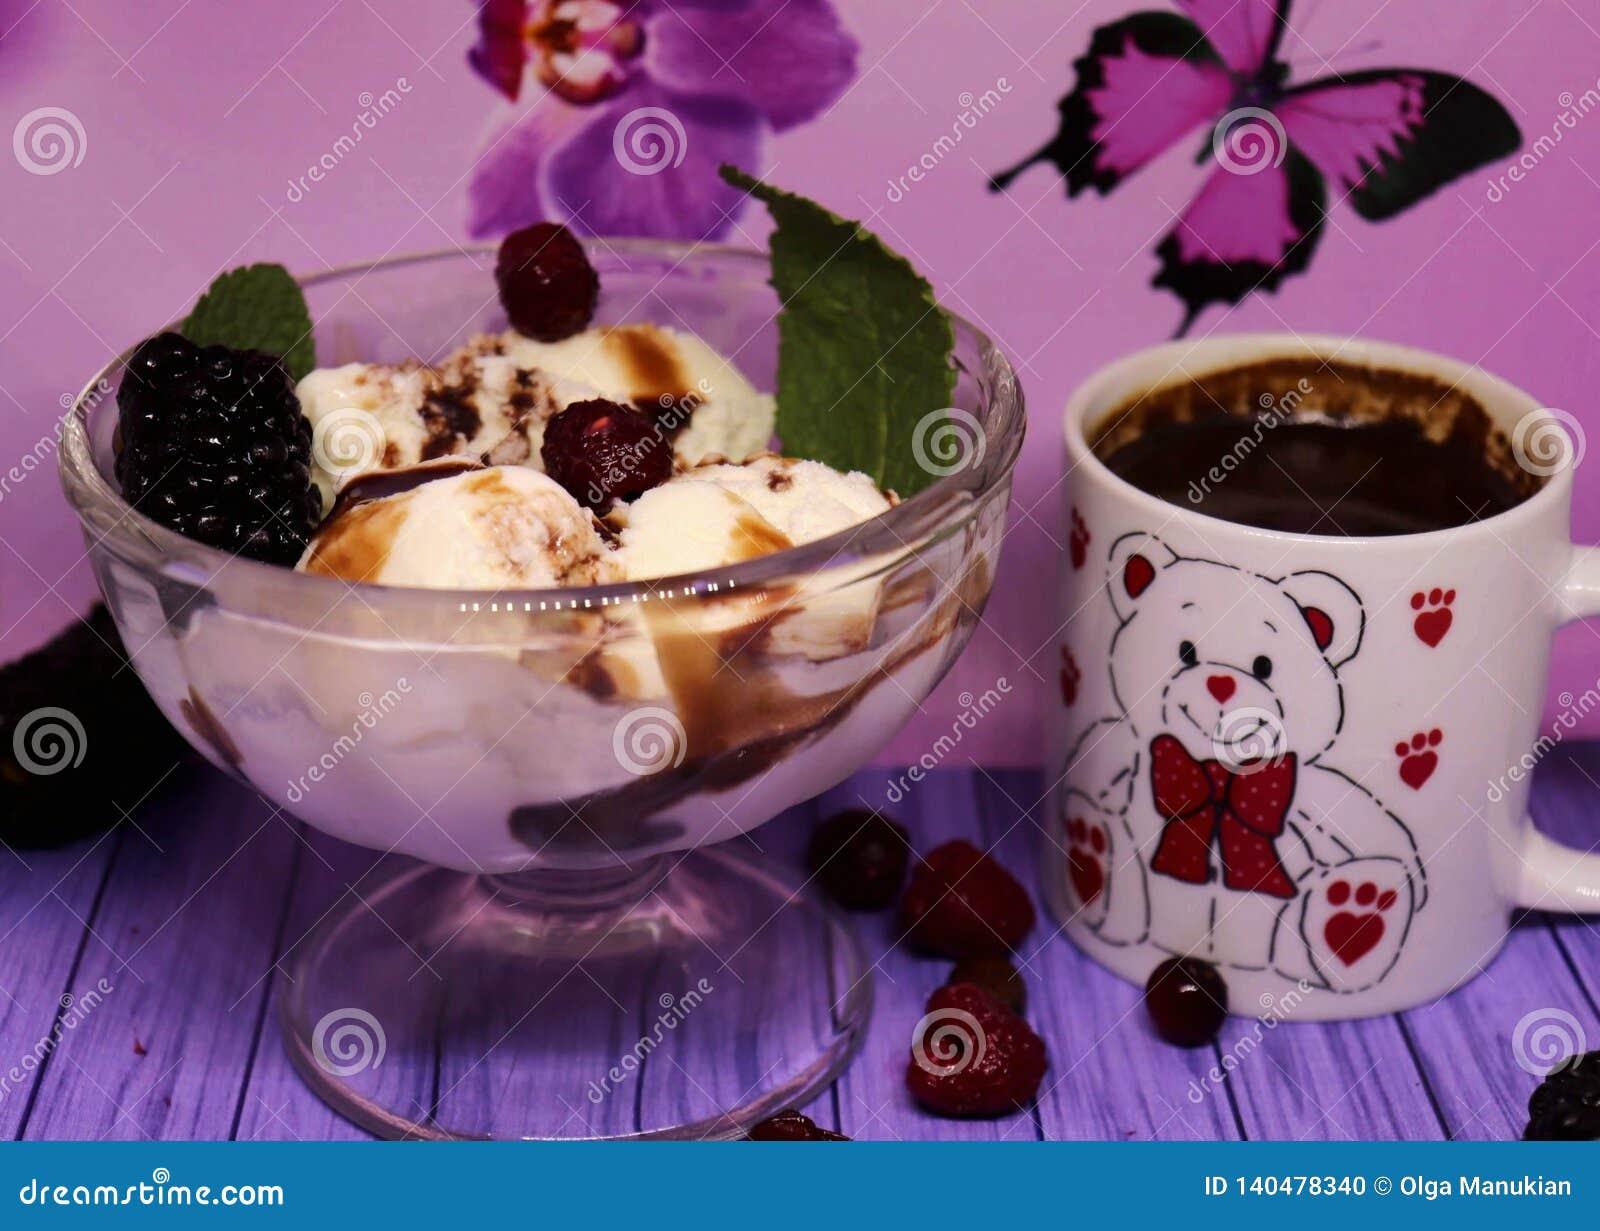 Gelado delicioso de baunilha, com chocolate e fruto delicioso, um copo pequeno do café natural